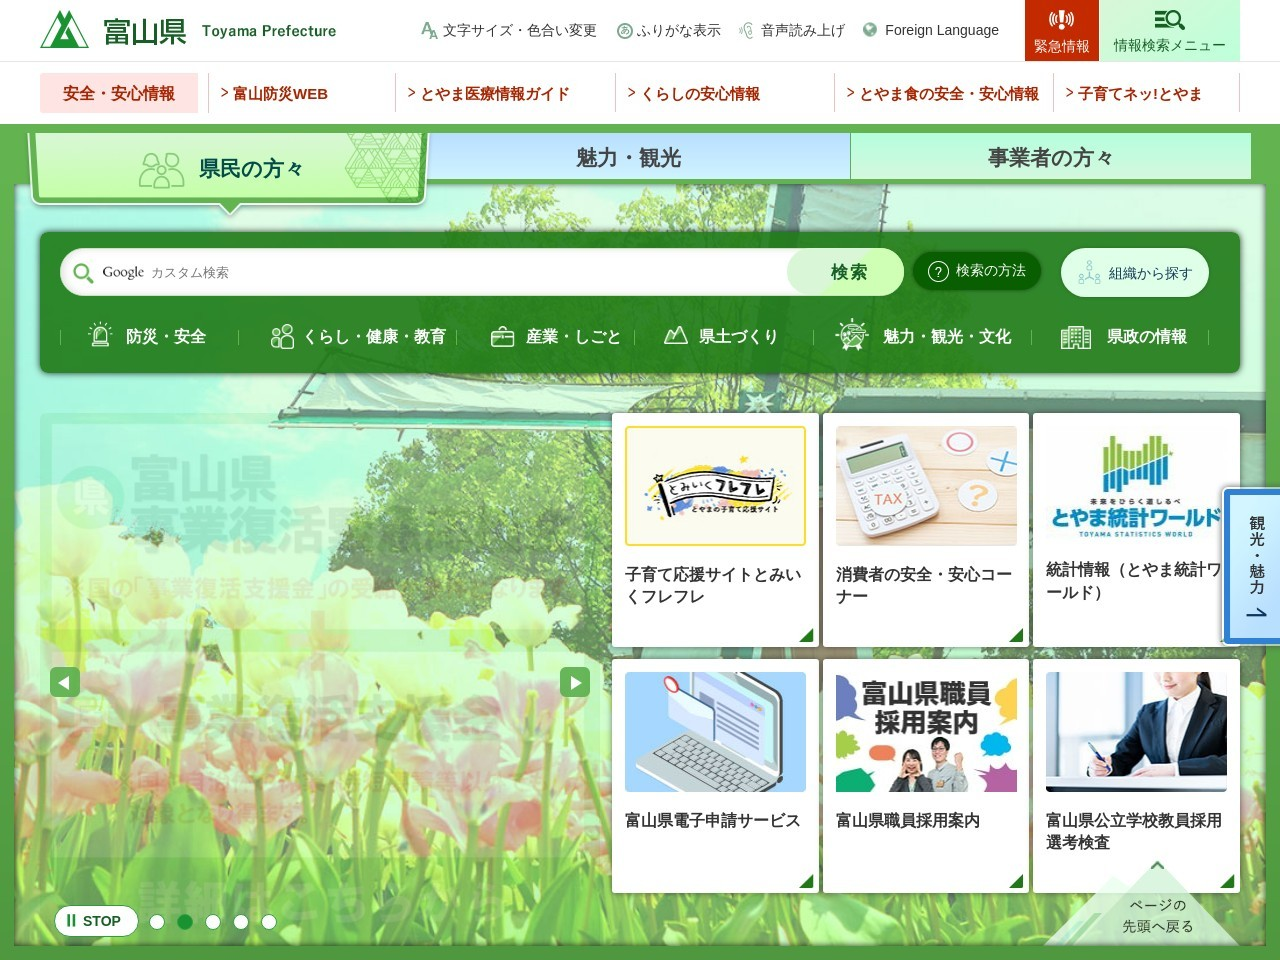 http://www.pref.toyama.jp/gaiyou/song.html